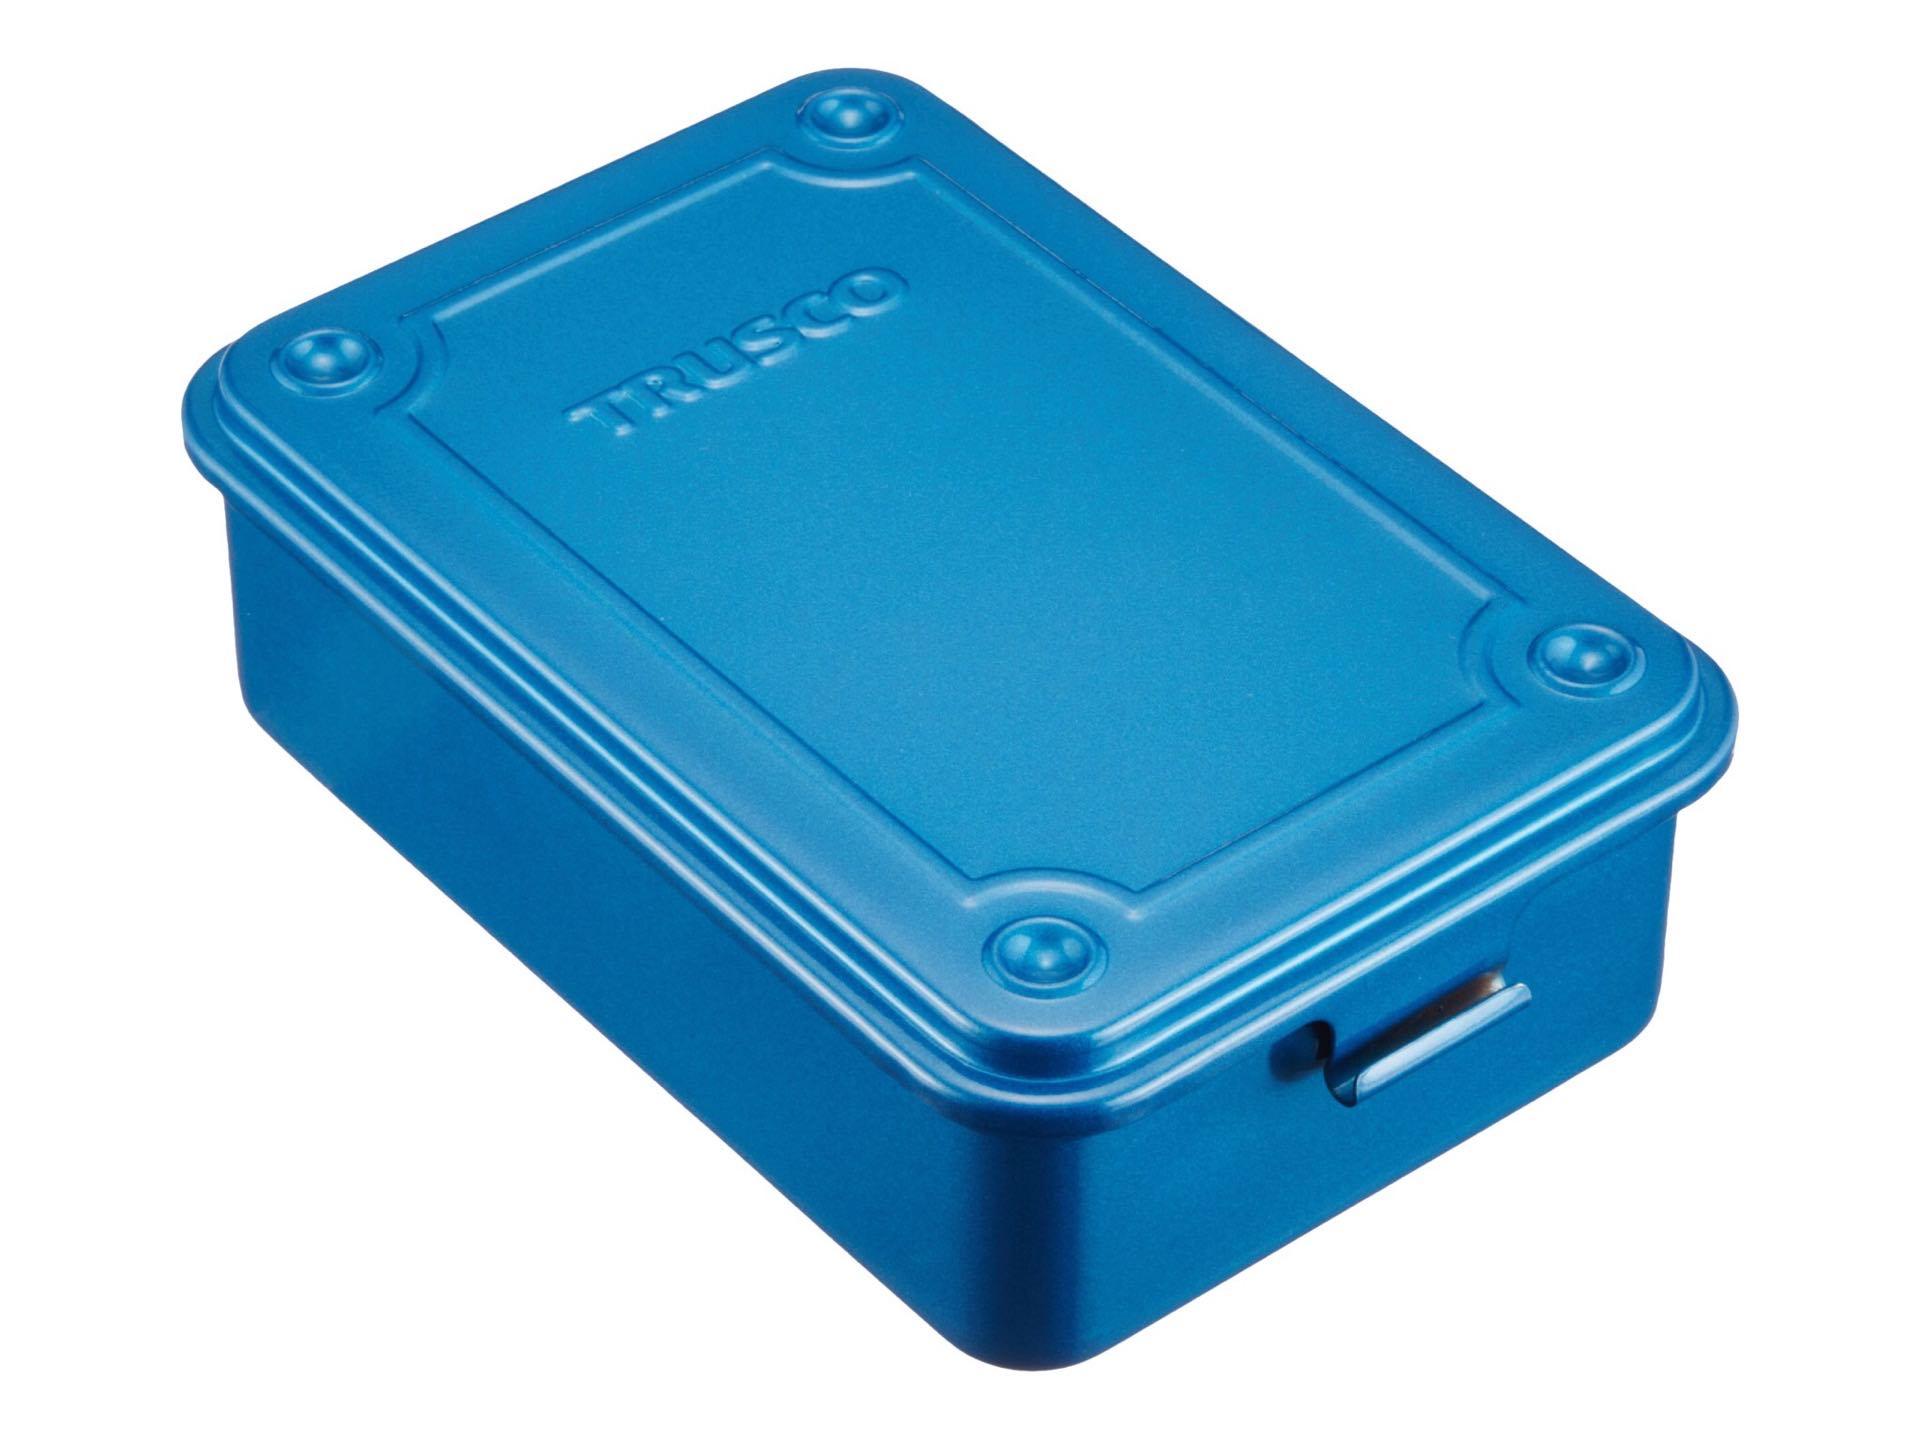 Trusco small tool box. ($15)